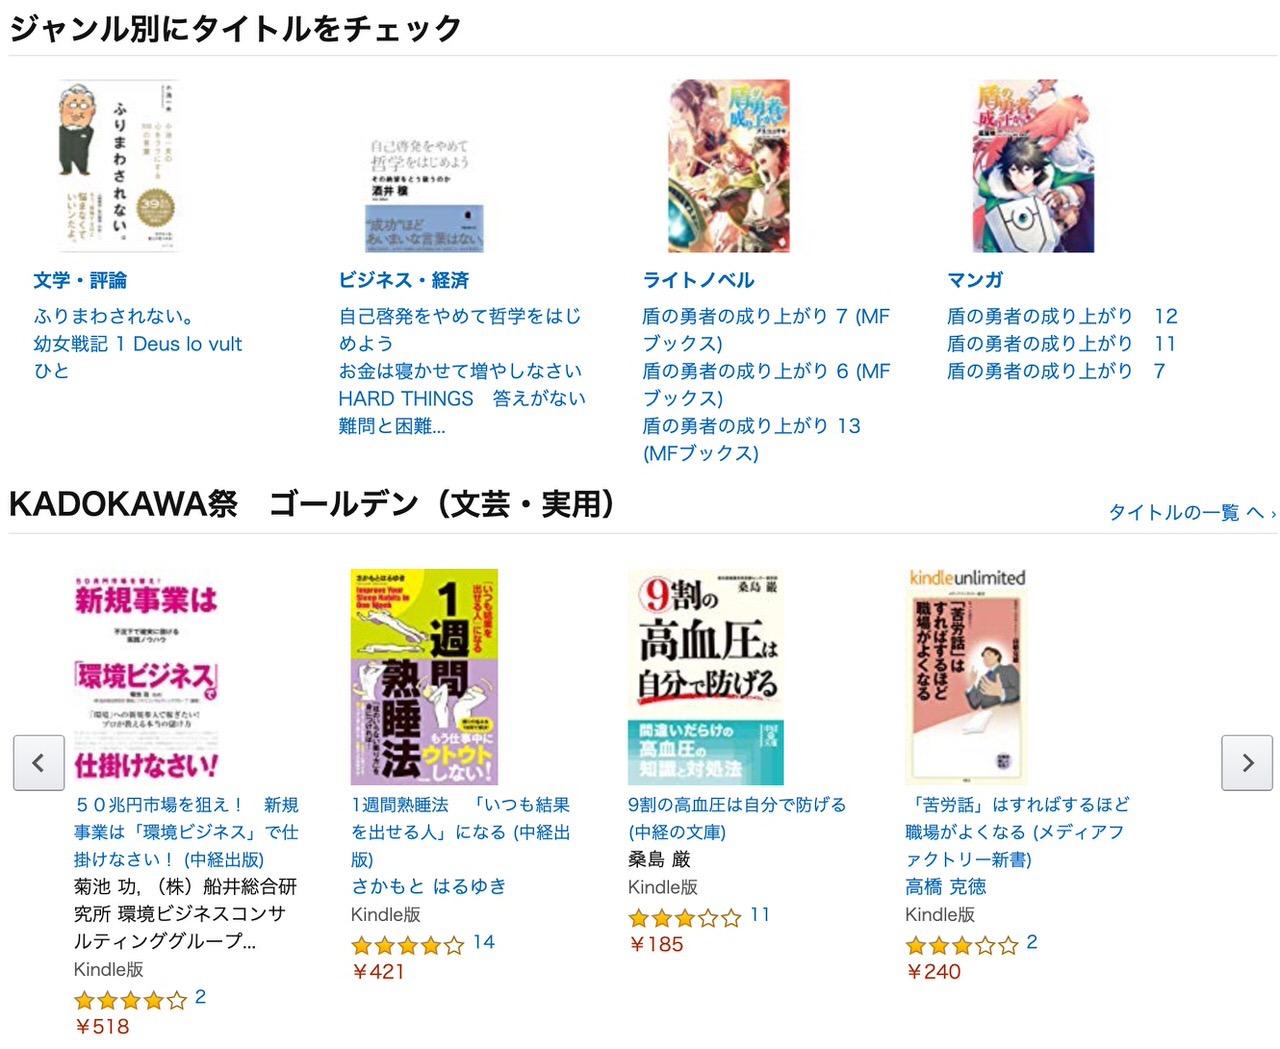 【Kindleセール】2万冊以上が40%オフ以上の大型セール「Kindle本GWセール」(5/9まで)